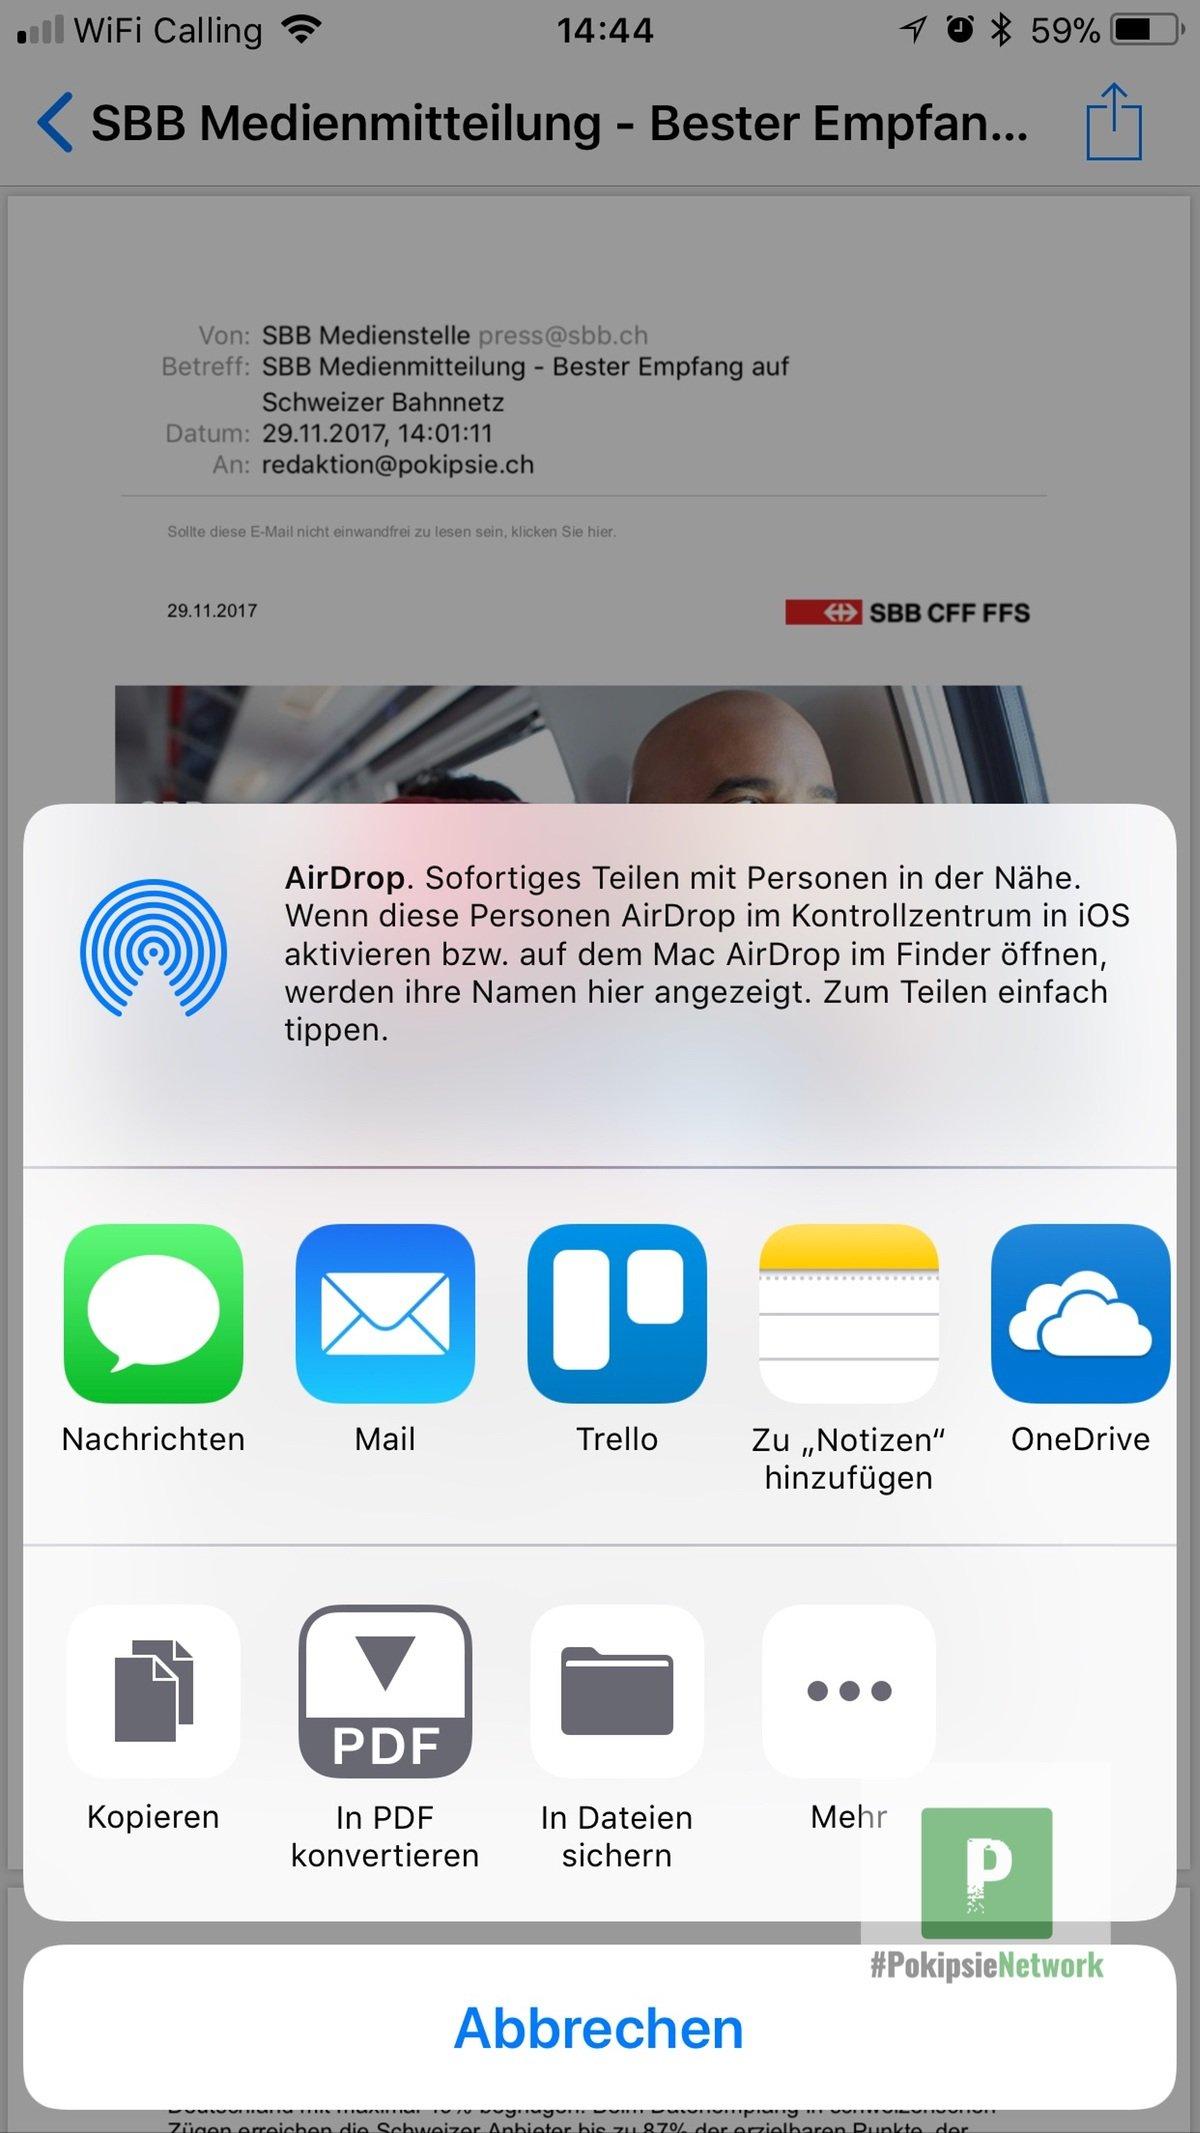 Tutorial – eMails auf dem iPhone in PDF umwandeln